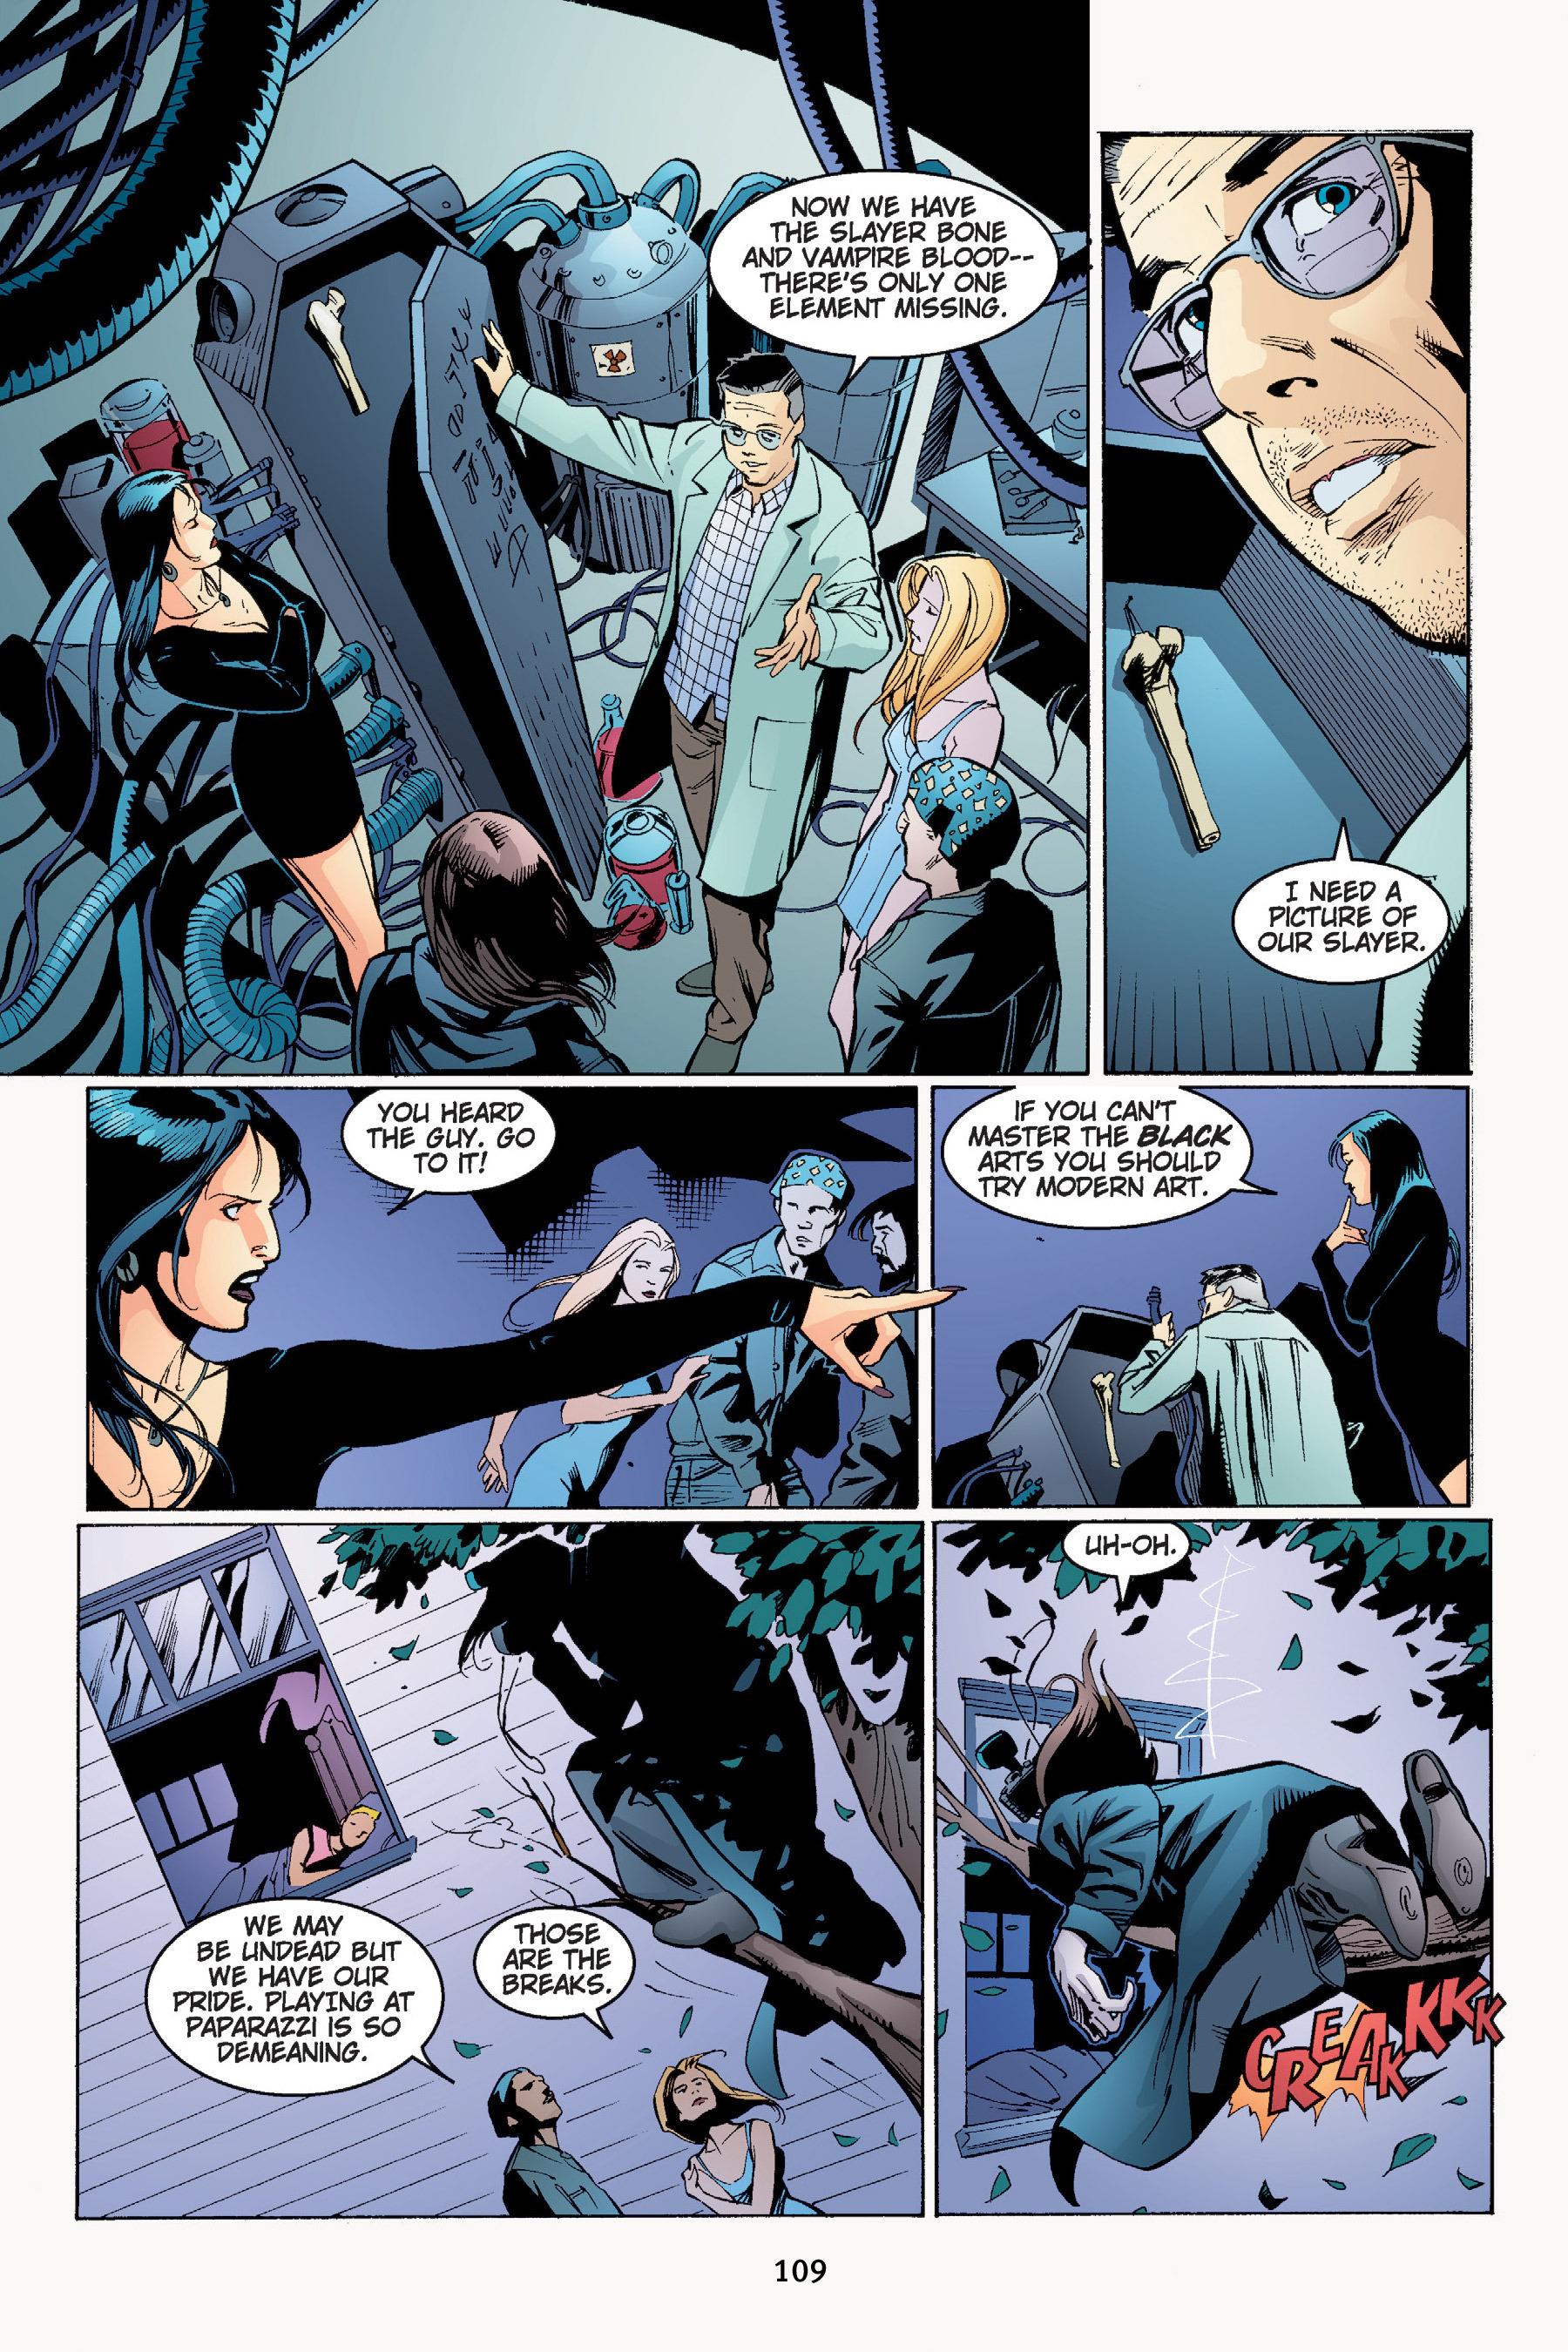 Read online Buffy the Vampire Slayer: Omnibus comic -  Issue # TPB 4 - 110